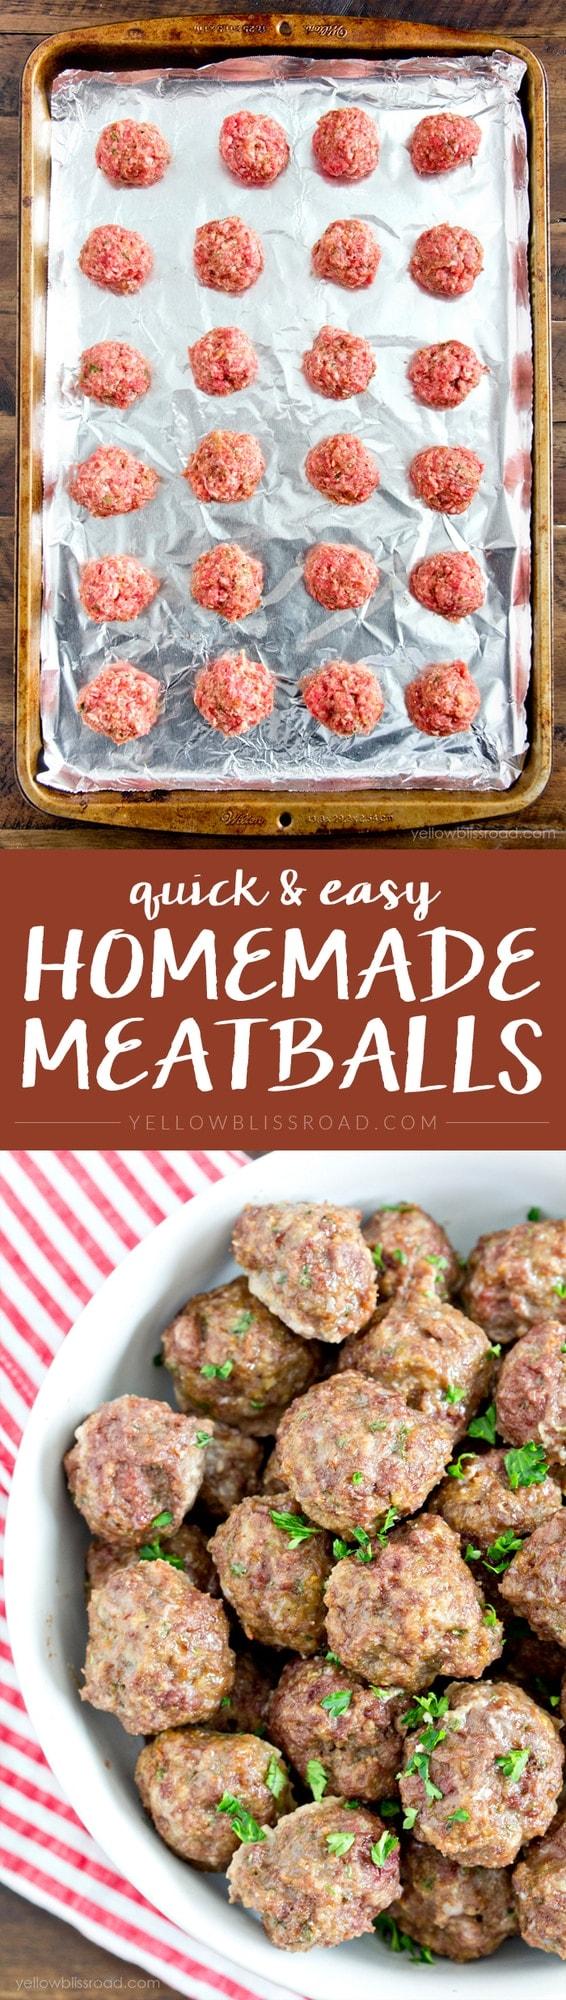 Easy Homemade Meatballs - How to make Homemade Meatballs - so easy!